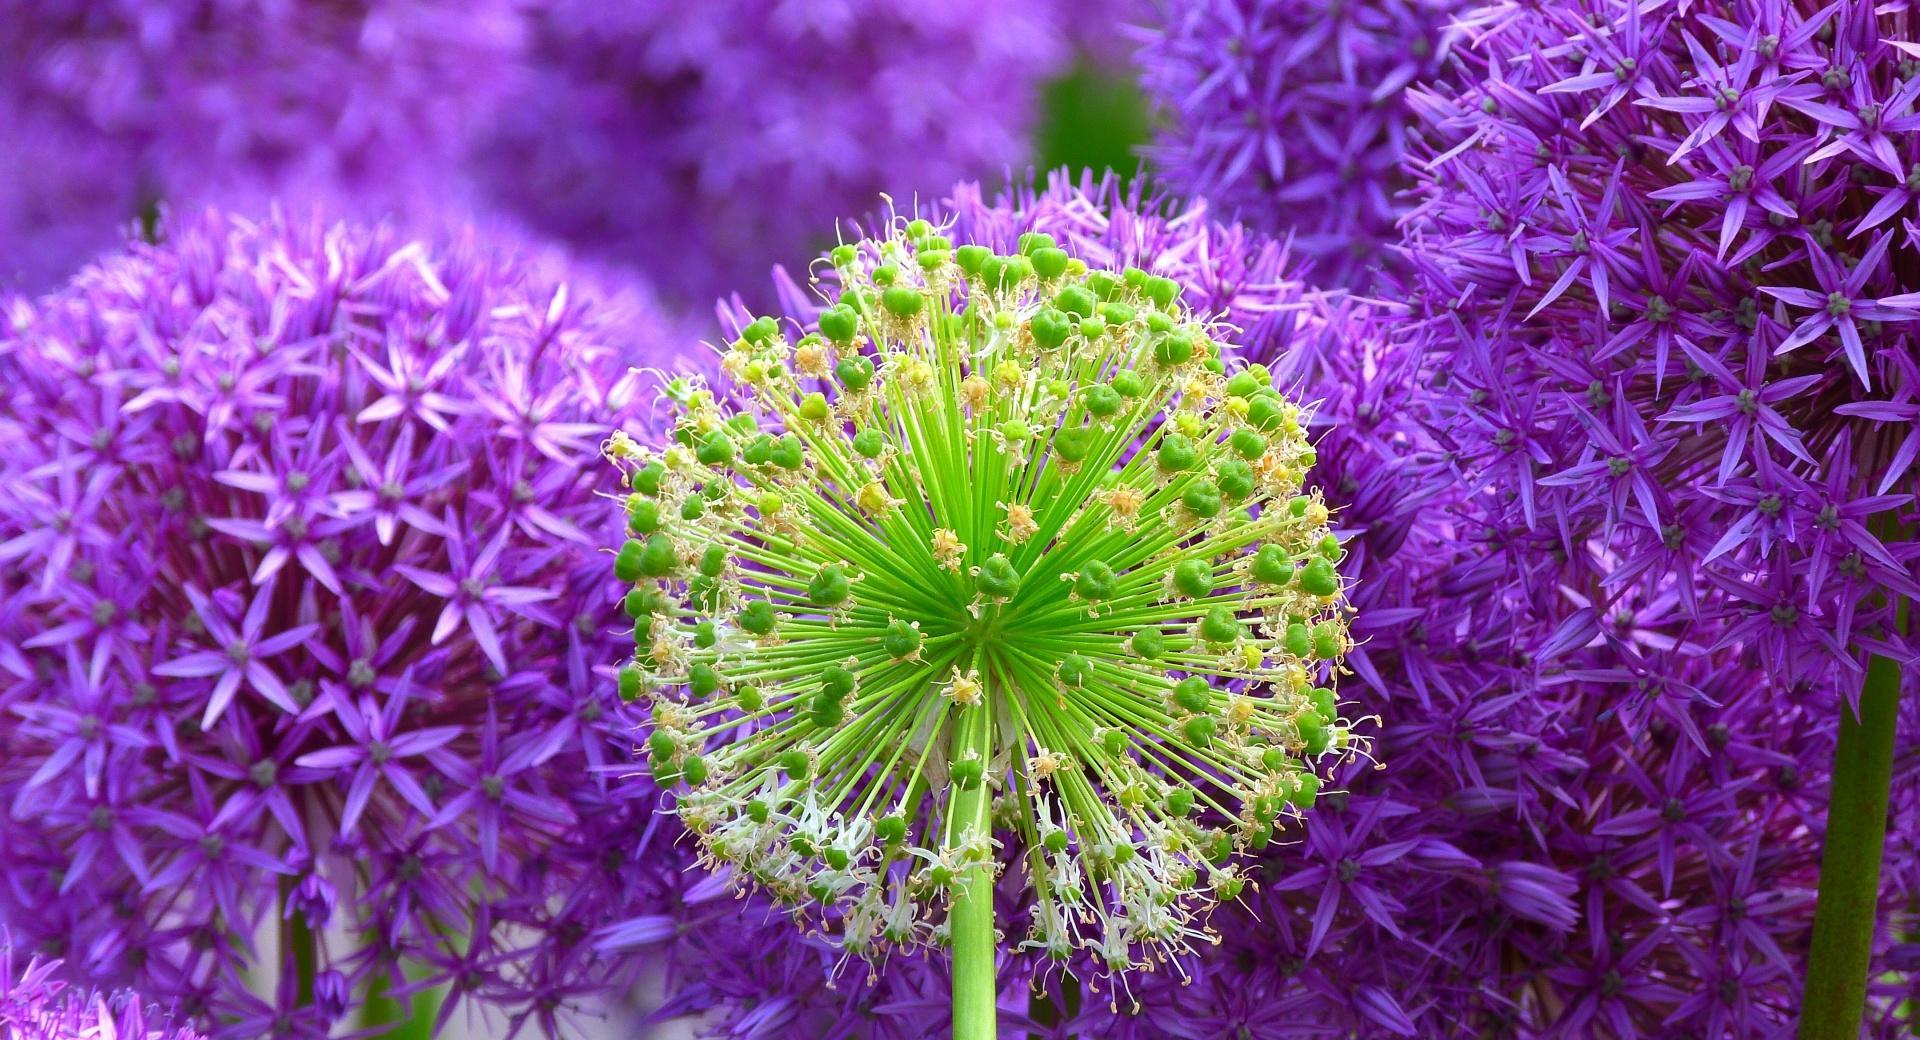 Purple Onion Flowers wallpapers HD quality